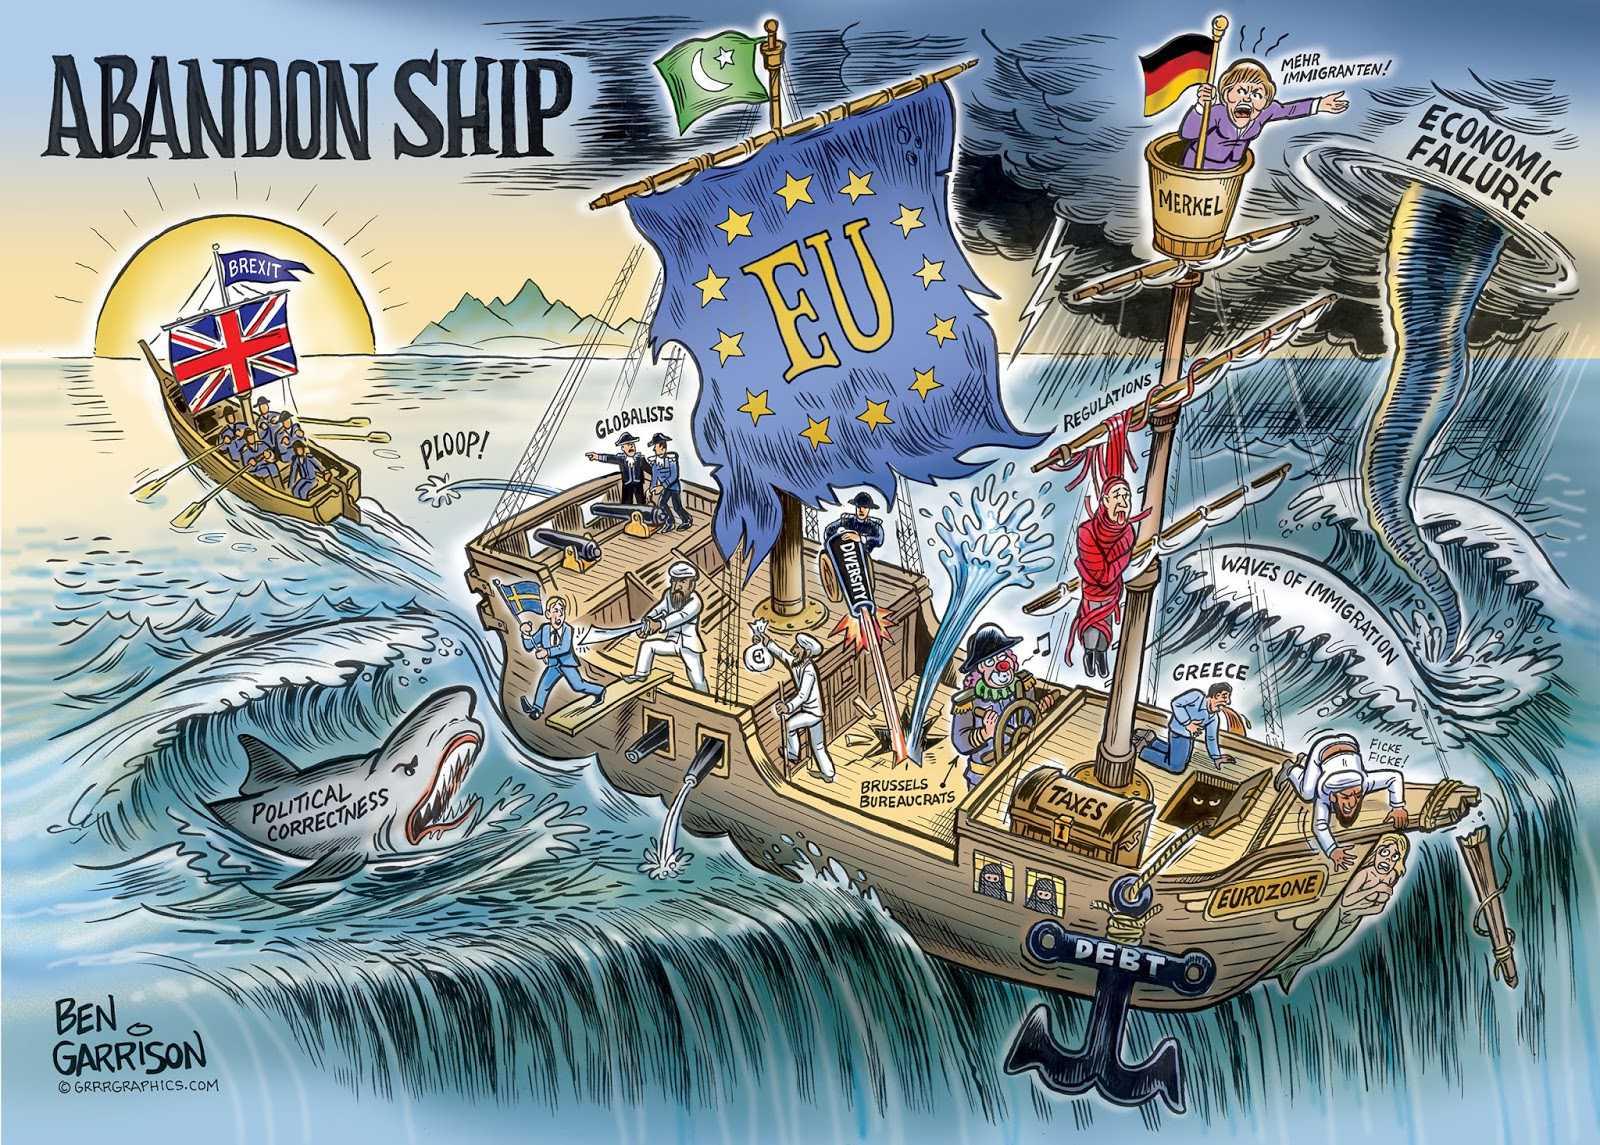 Ben Garrison Abandon Ship (2016). ©crrrgraphic.com